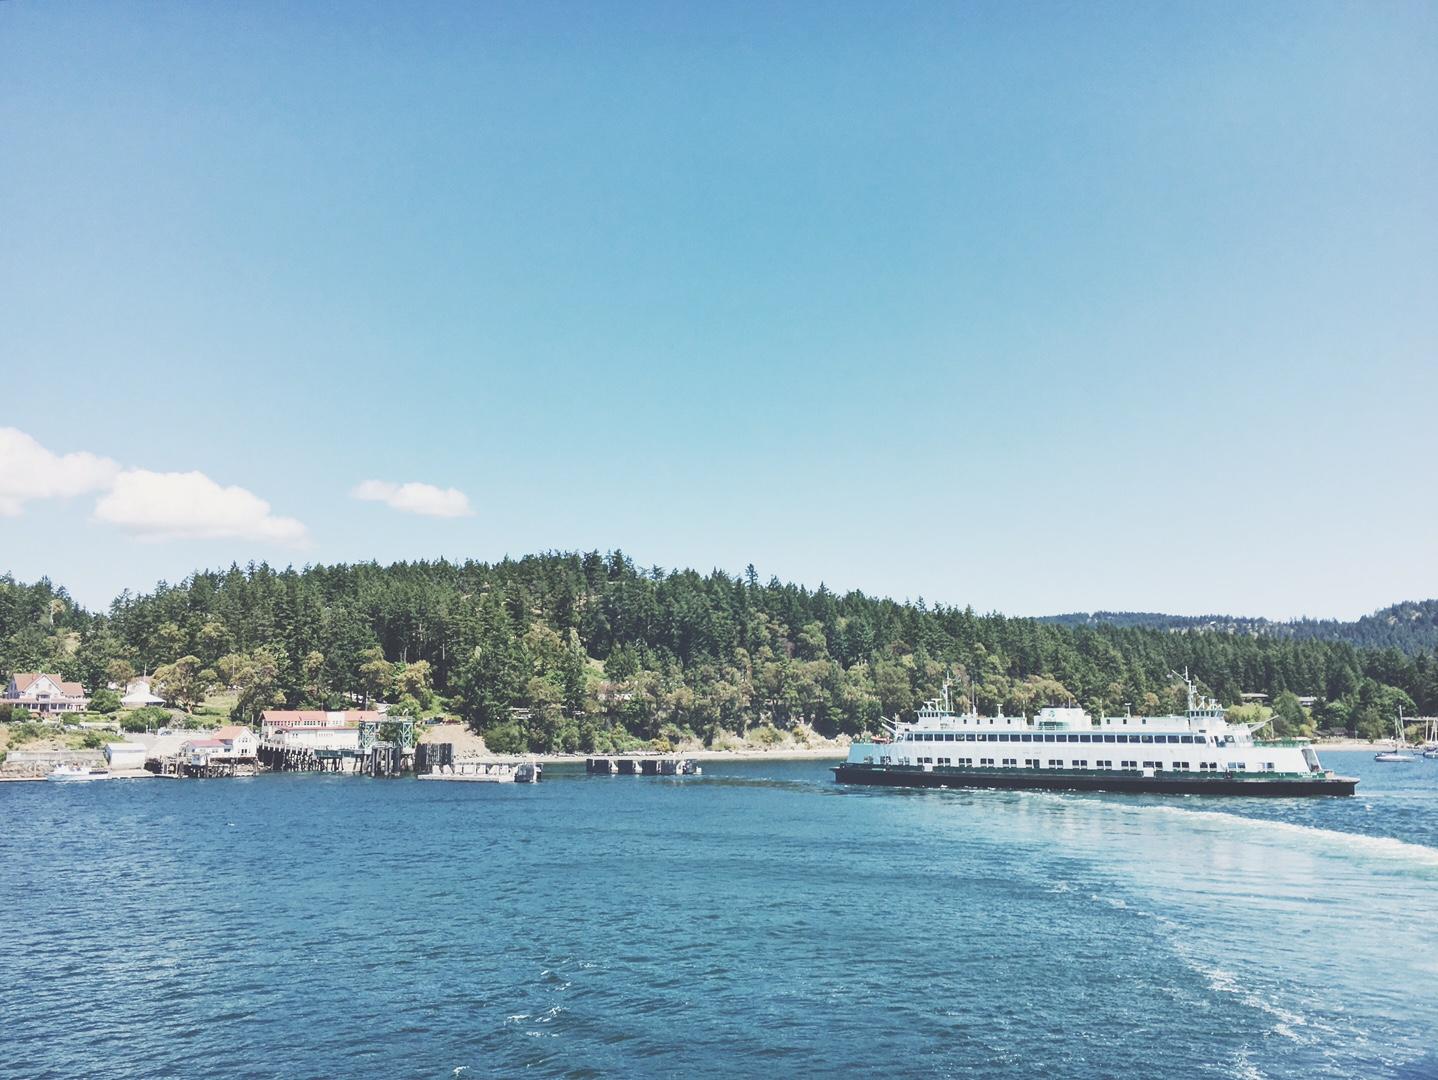 Orcas Ferry Dock